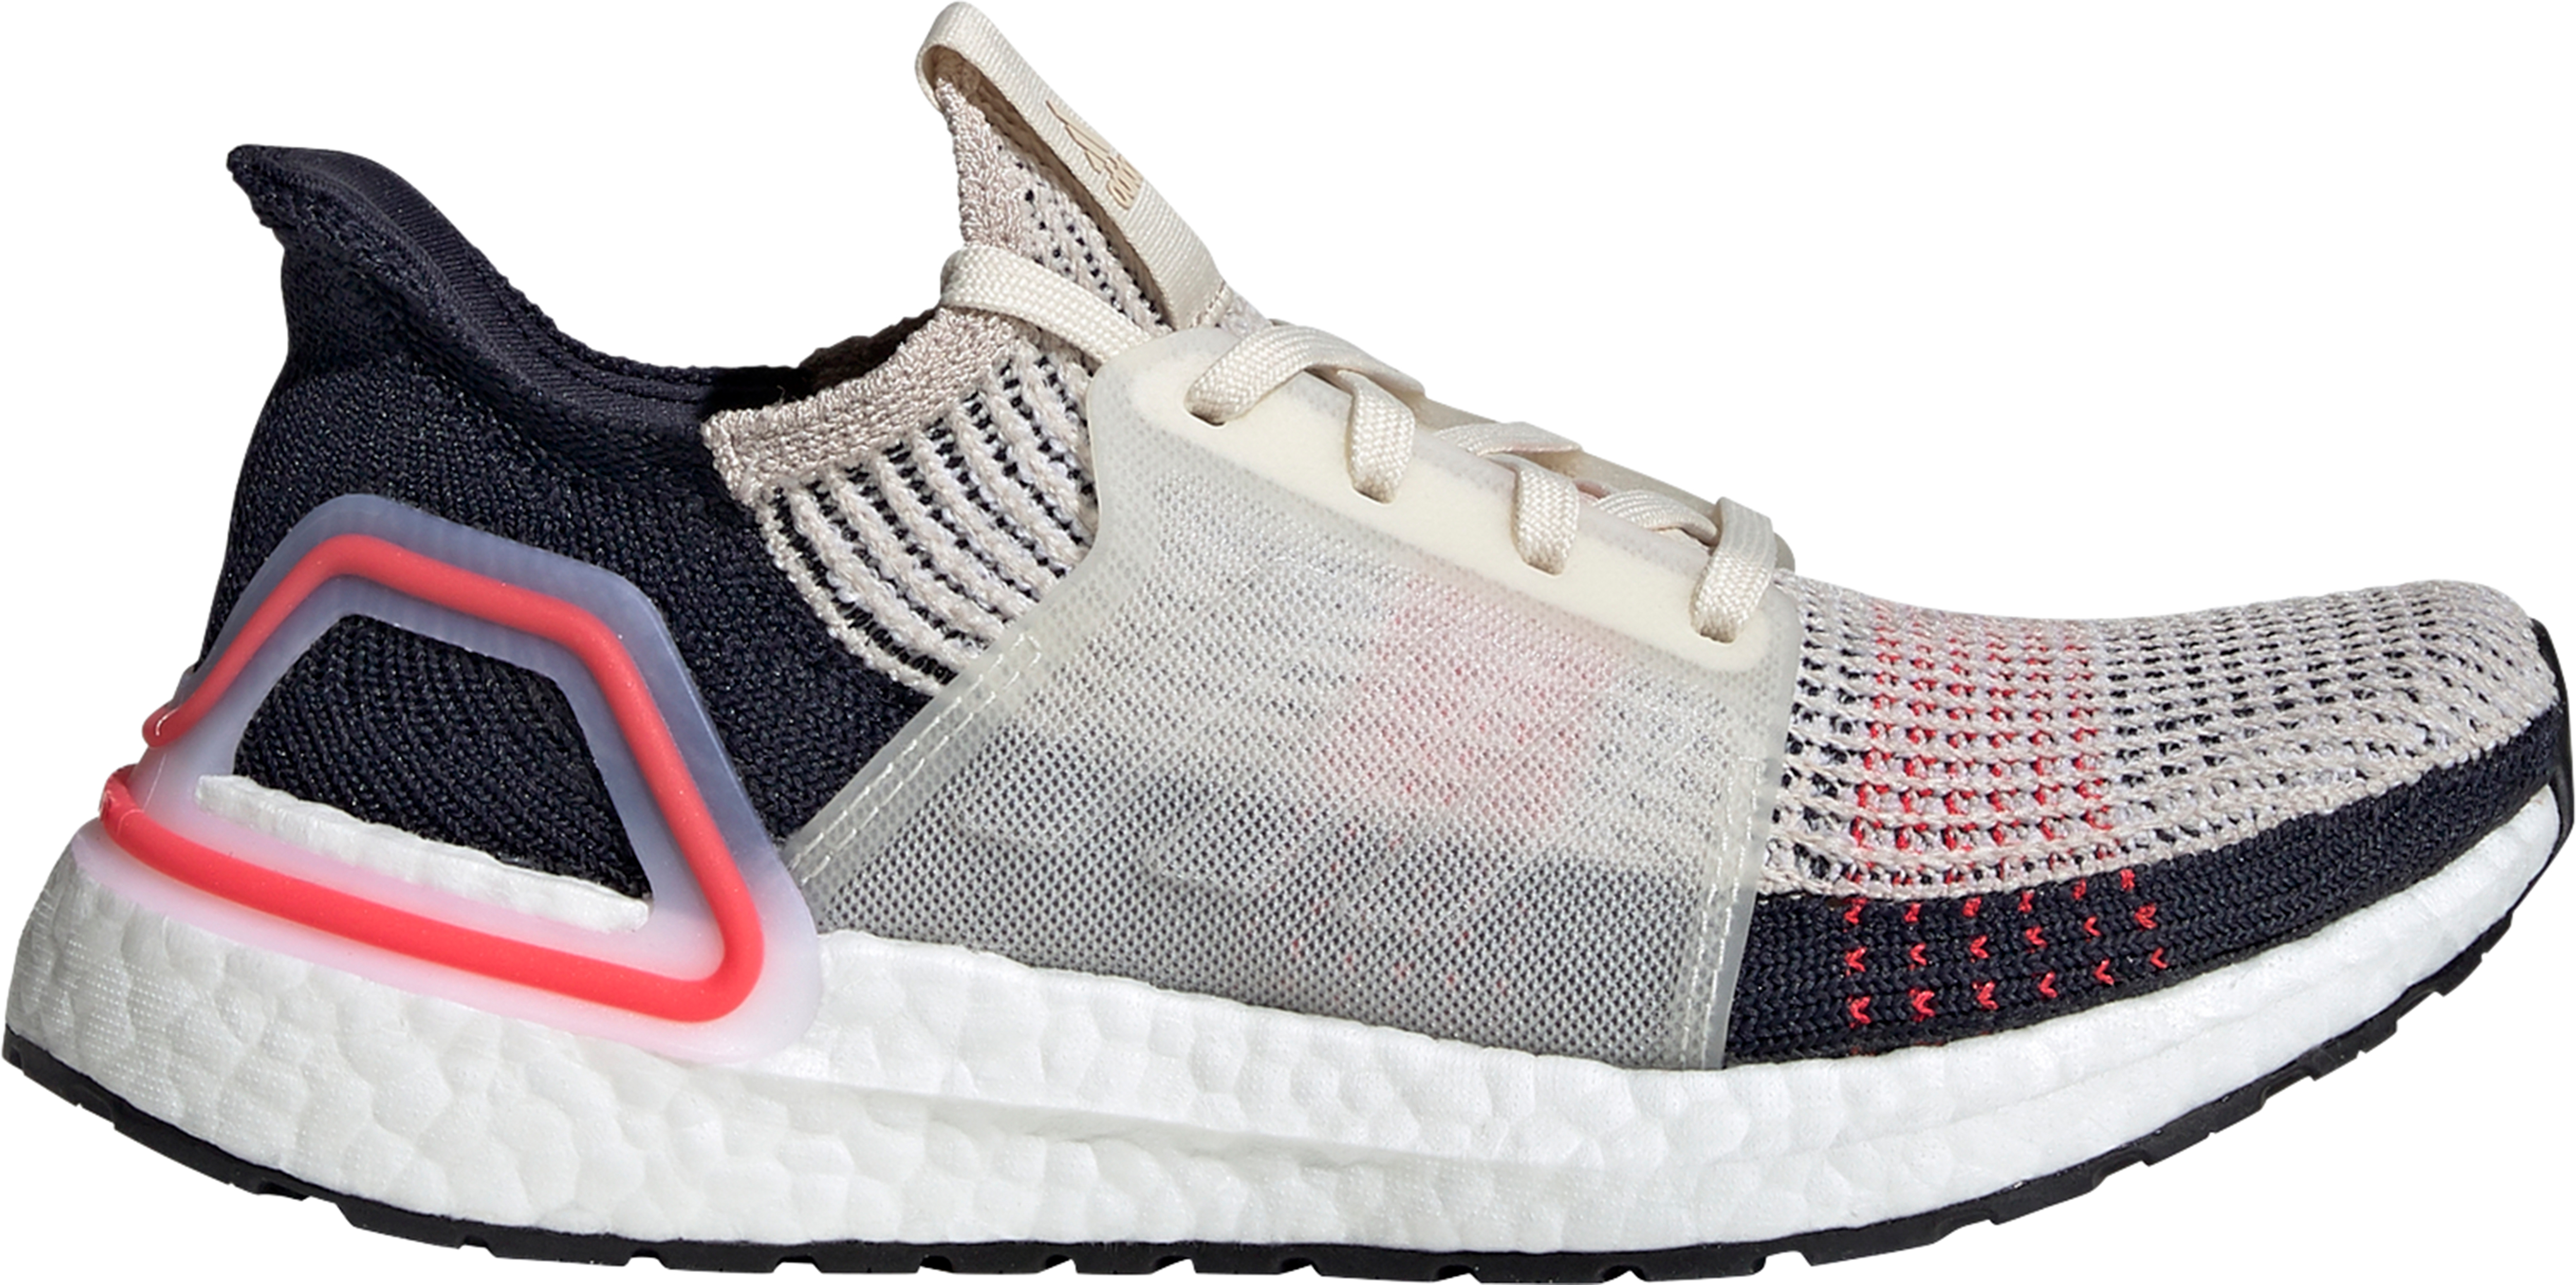 promo code f73b6 15c3c Adidas Ultraboost 19 Road Running Shoes - Women's